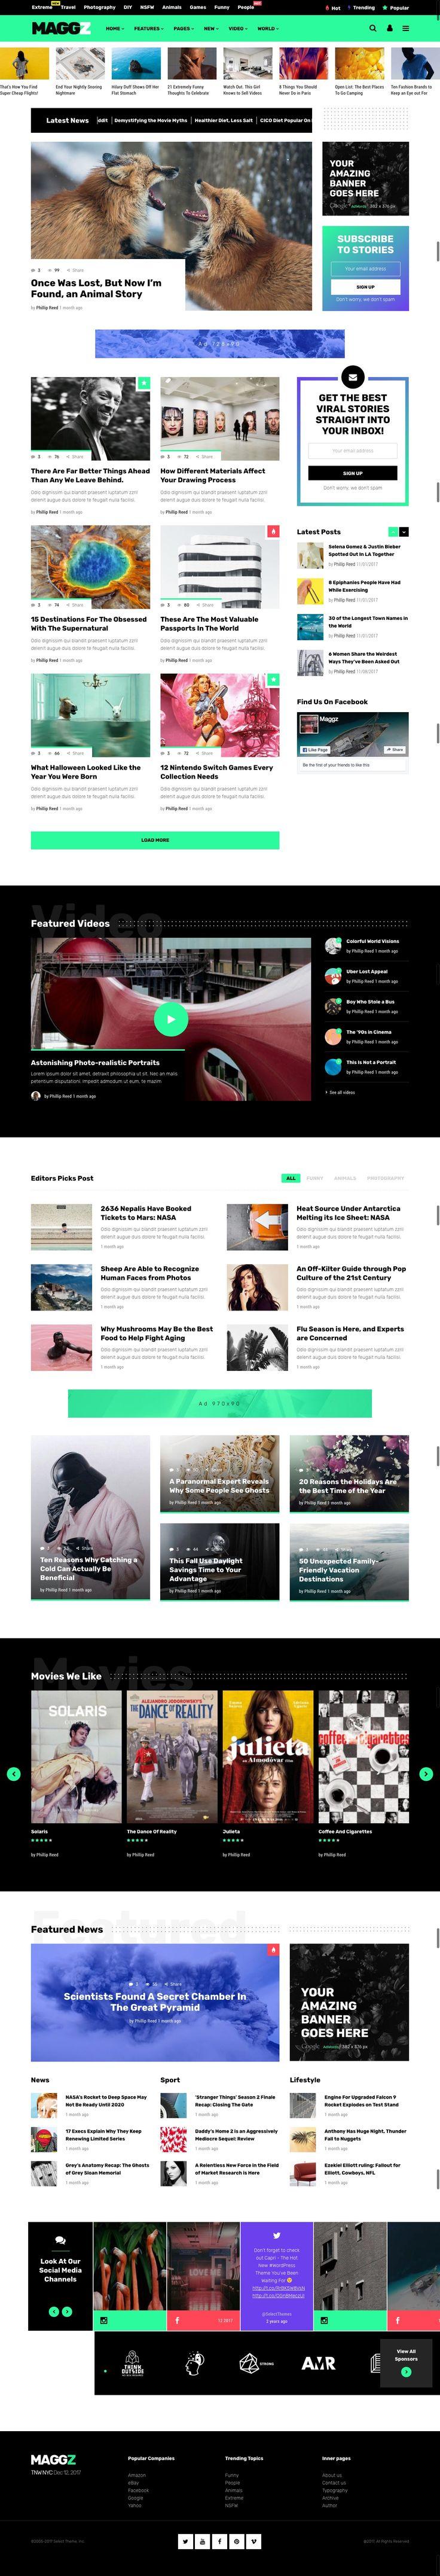 A Creative Viral Magazine and Blog Theme